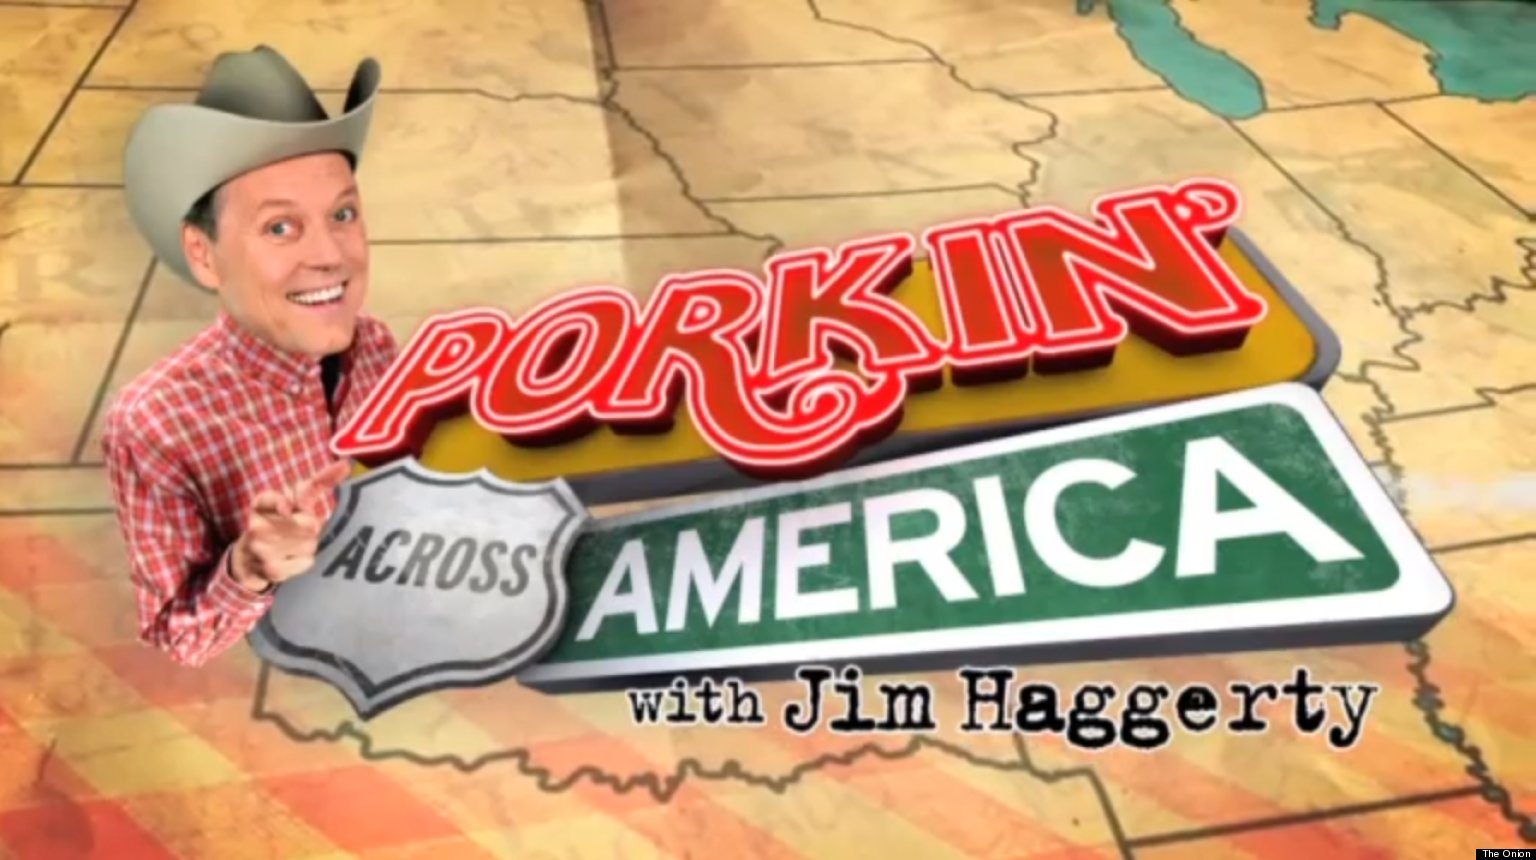 Brad Holbrook in Porkin' Across America (2012)